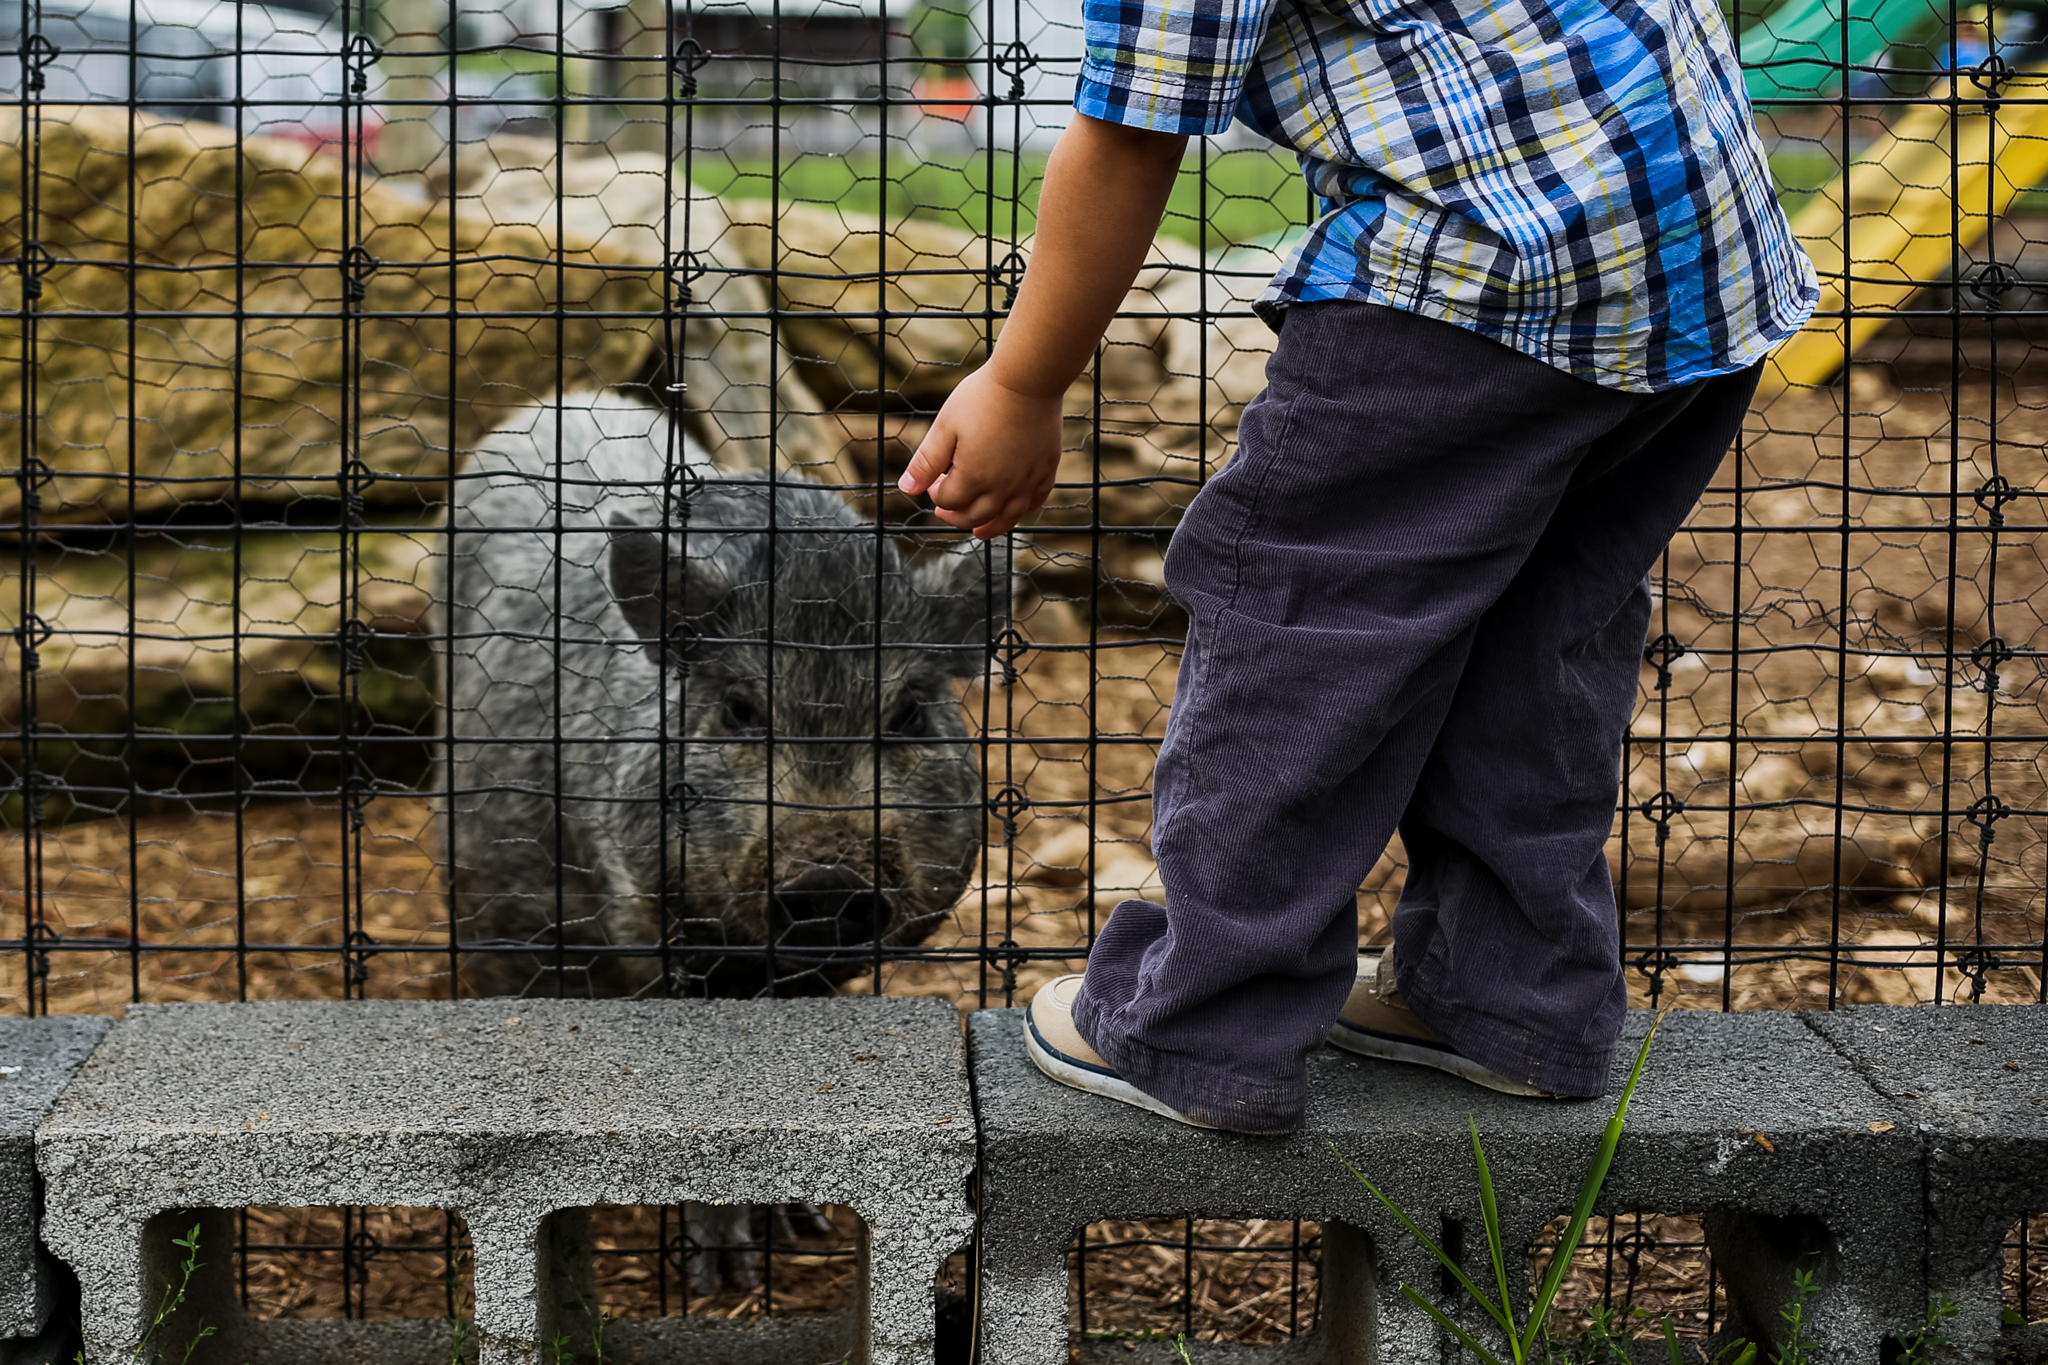 Boy_Pig_Grims_Orchard.jpg